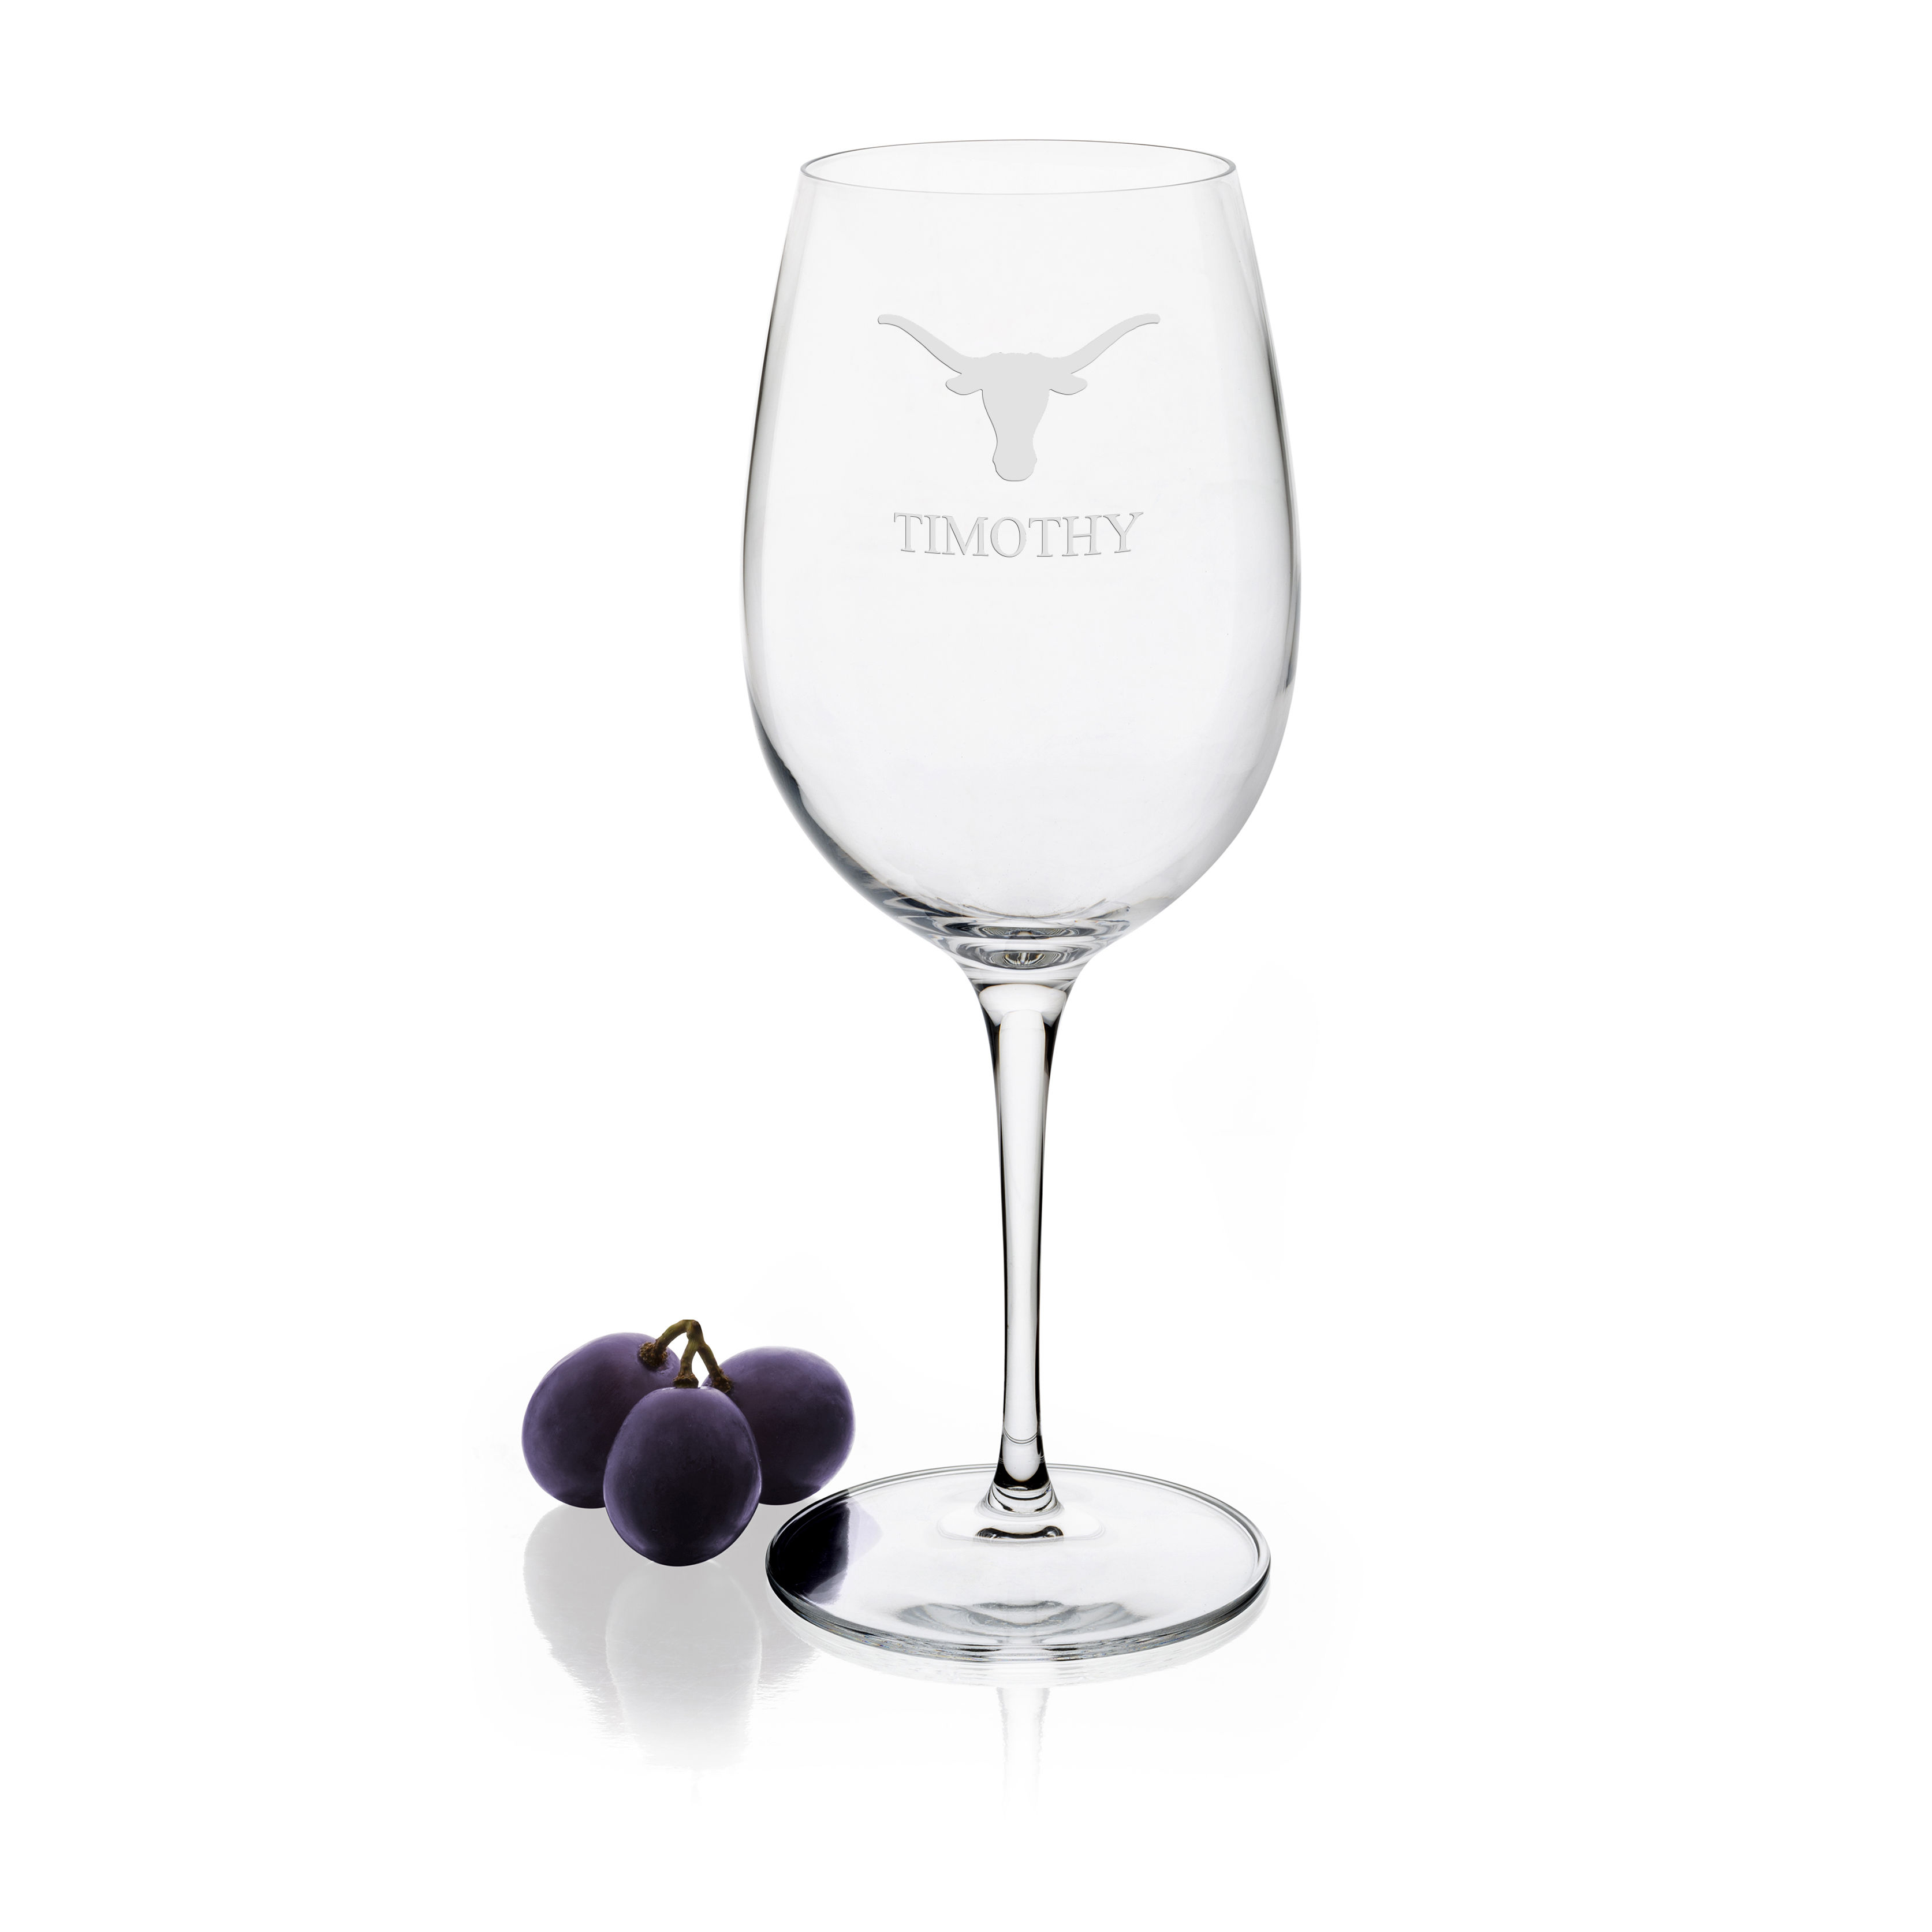 University of Texas Red Wine Glasses - Set of 4